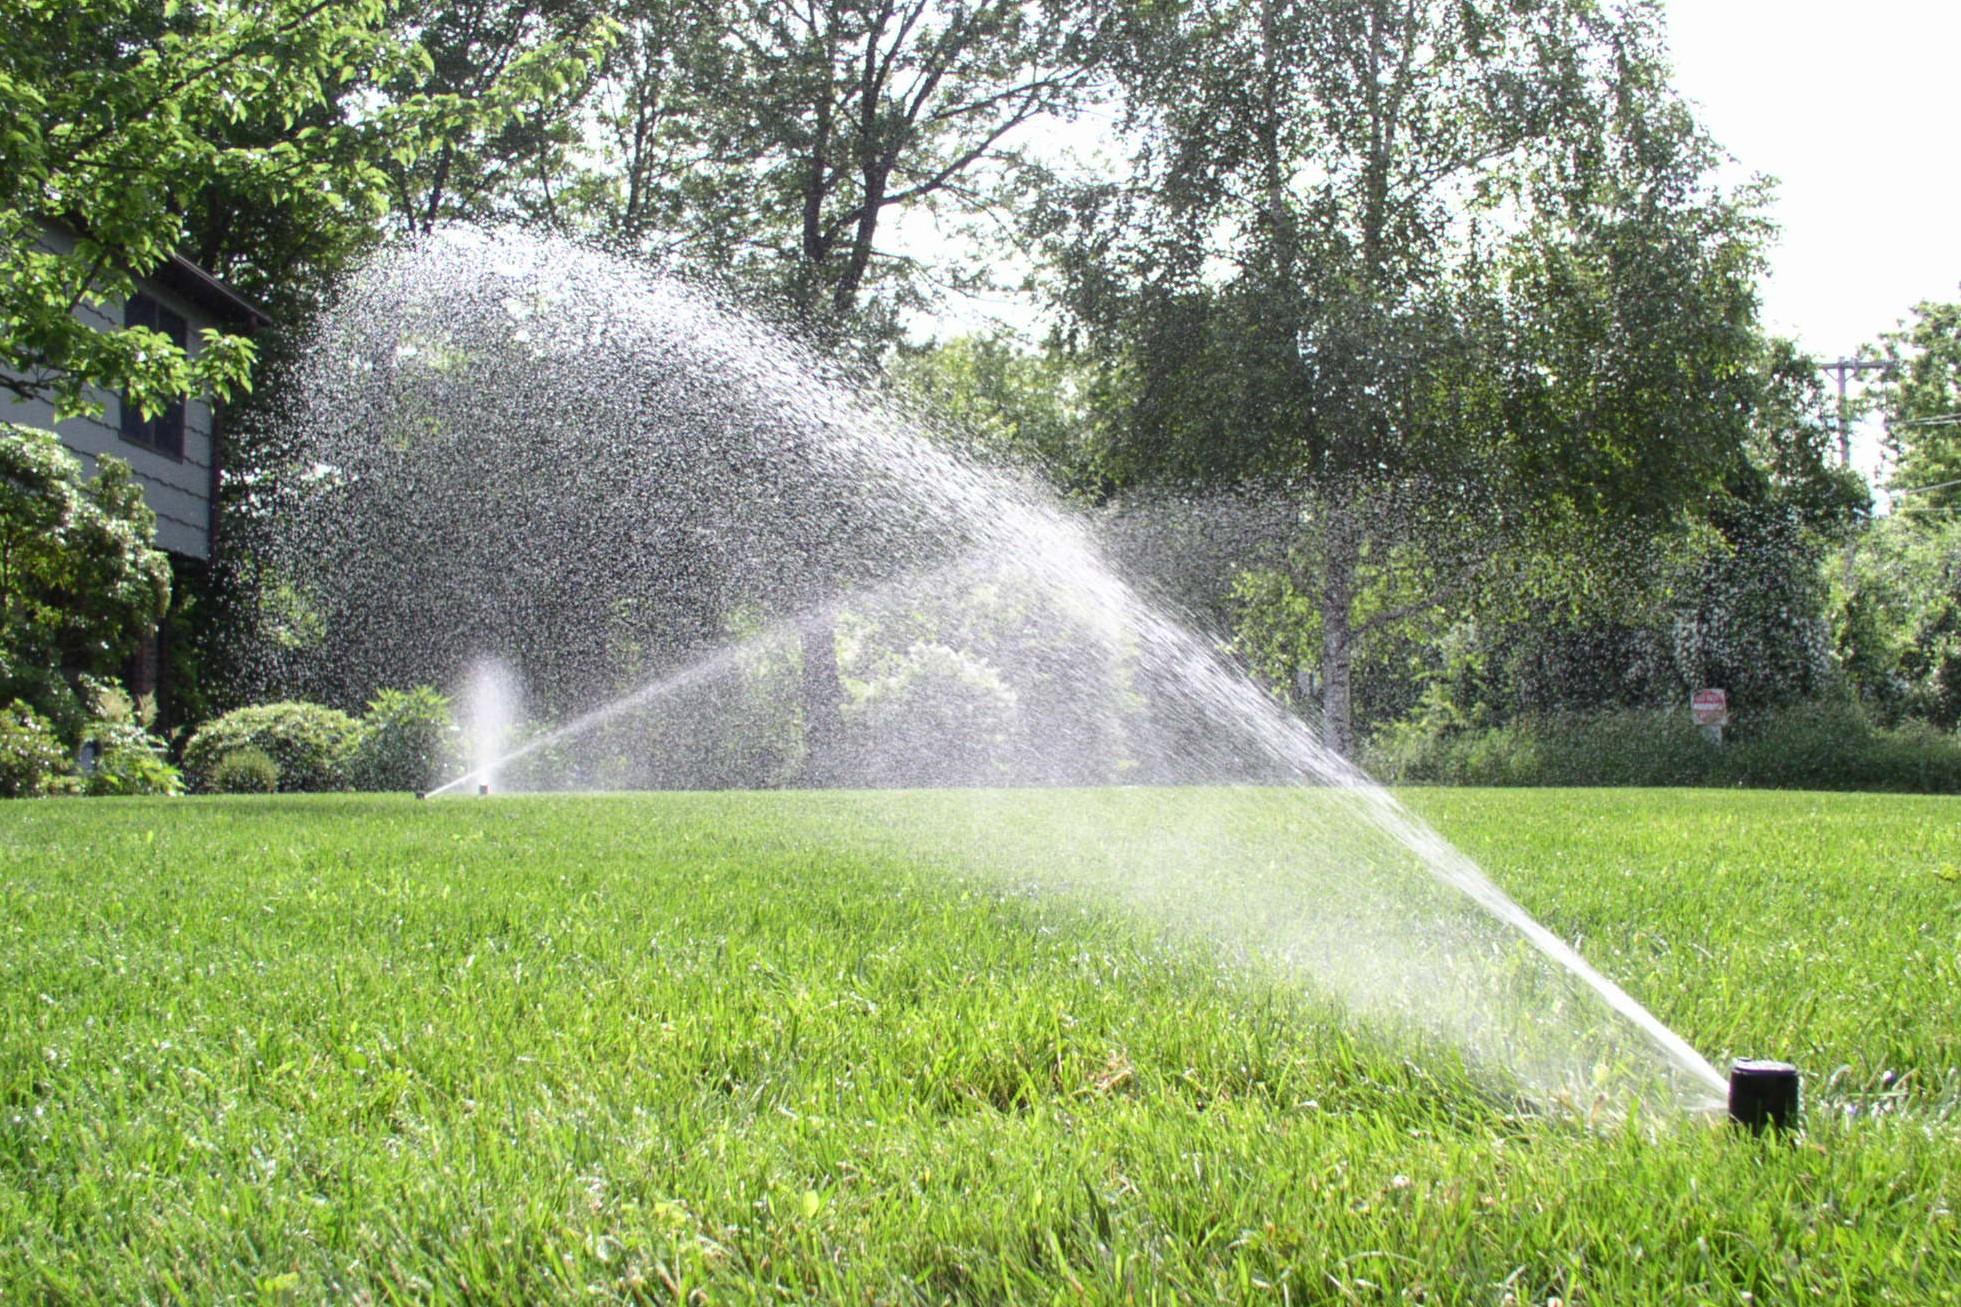 Jaques irrigation - Aspersores de riego ...